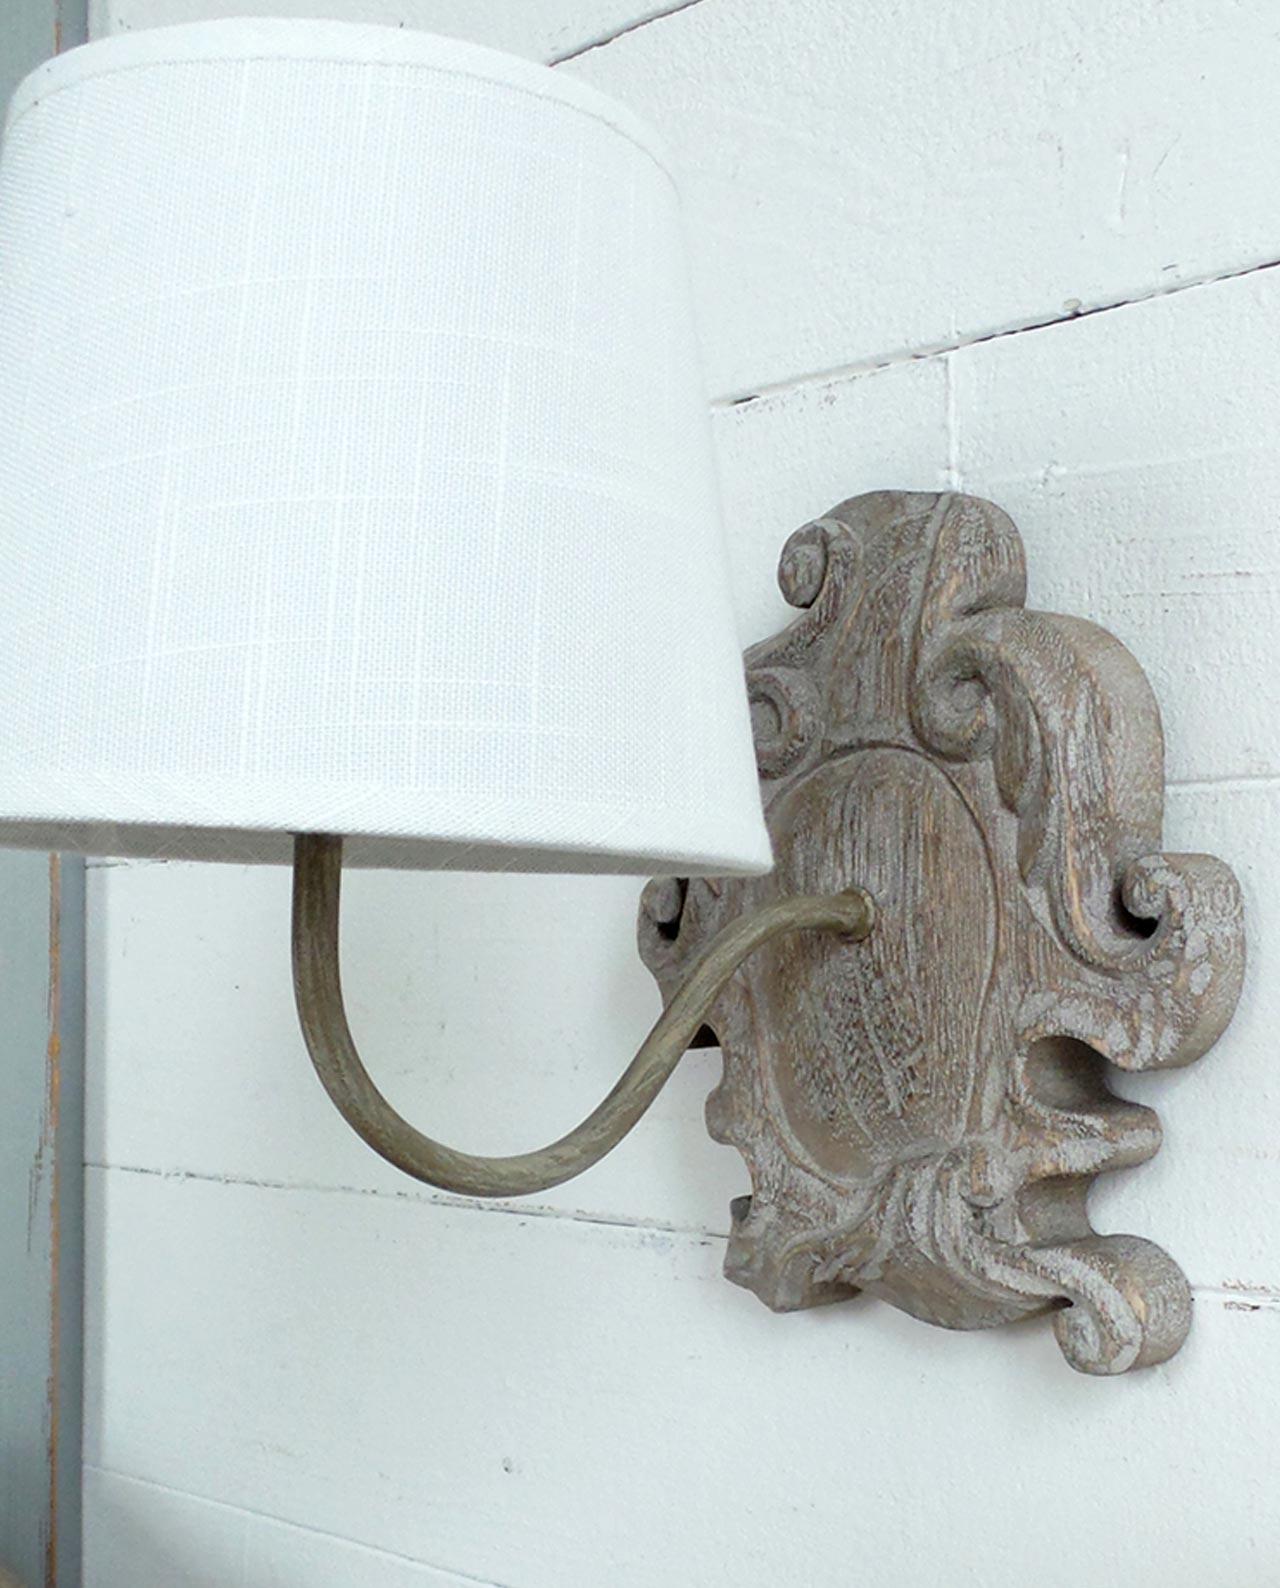 Applique da parete legno con bordi irregolari mobiliastore for Applique da parete legno